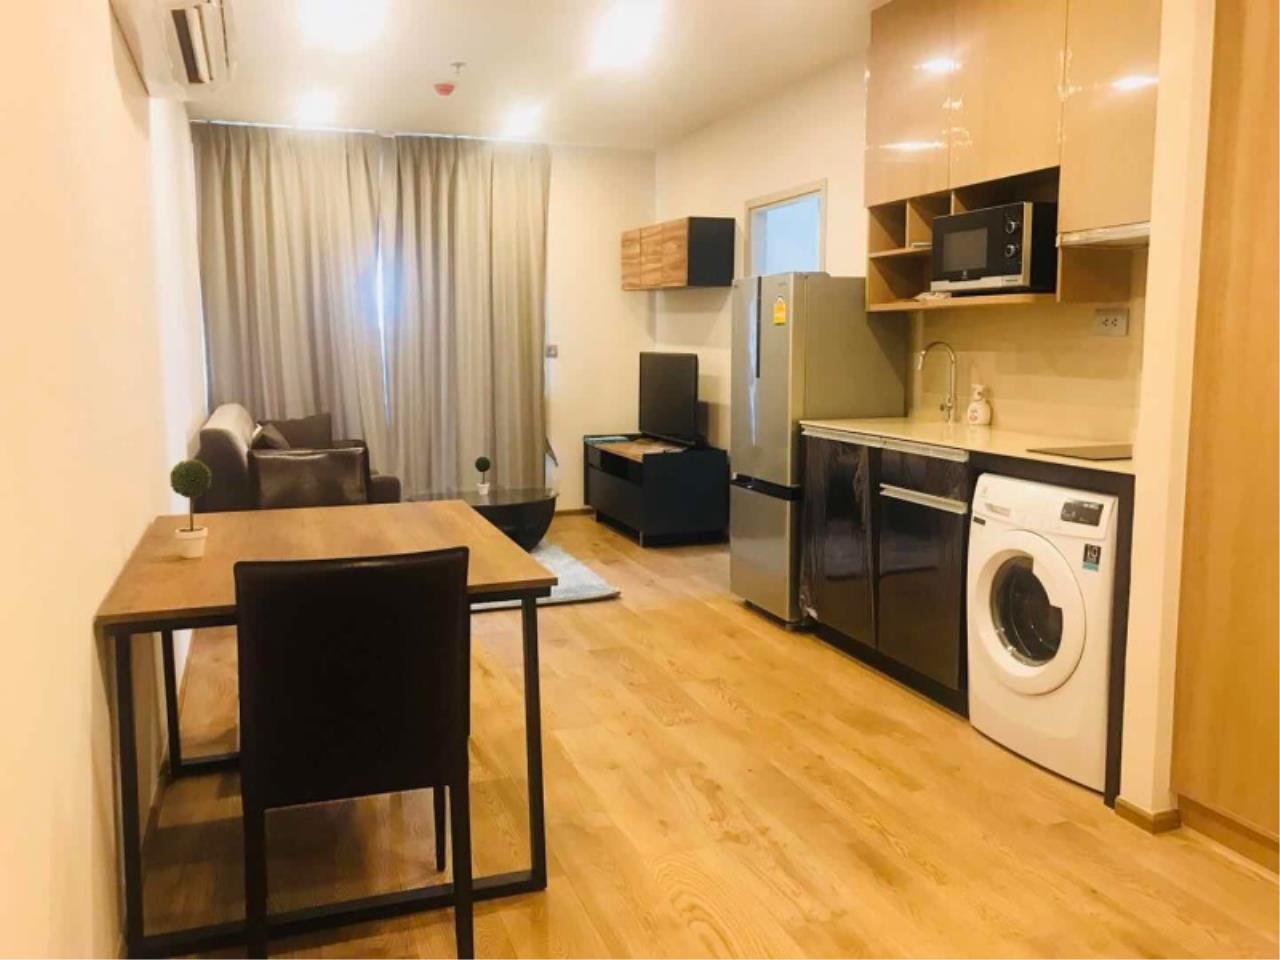 Century21 Skylux Agency's Q Chidlom – Phetchaburi / Condo For Rent / 2 Bedroom / 63 SQM / BTS Chit Lom / Bangkok 2